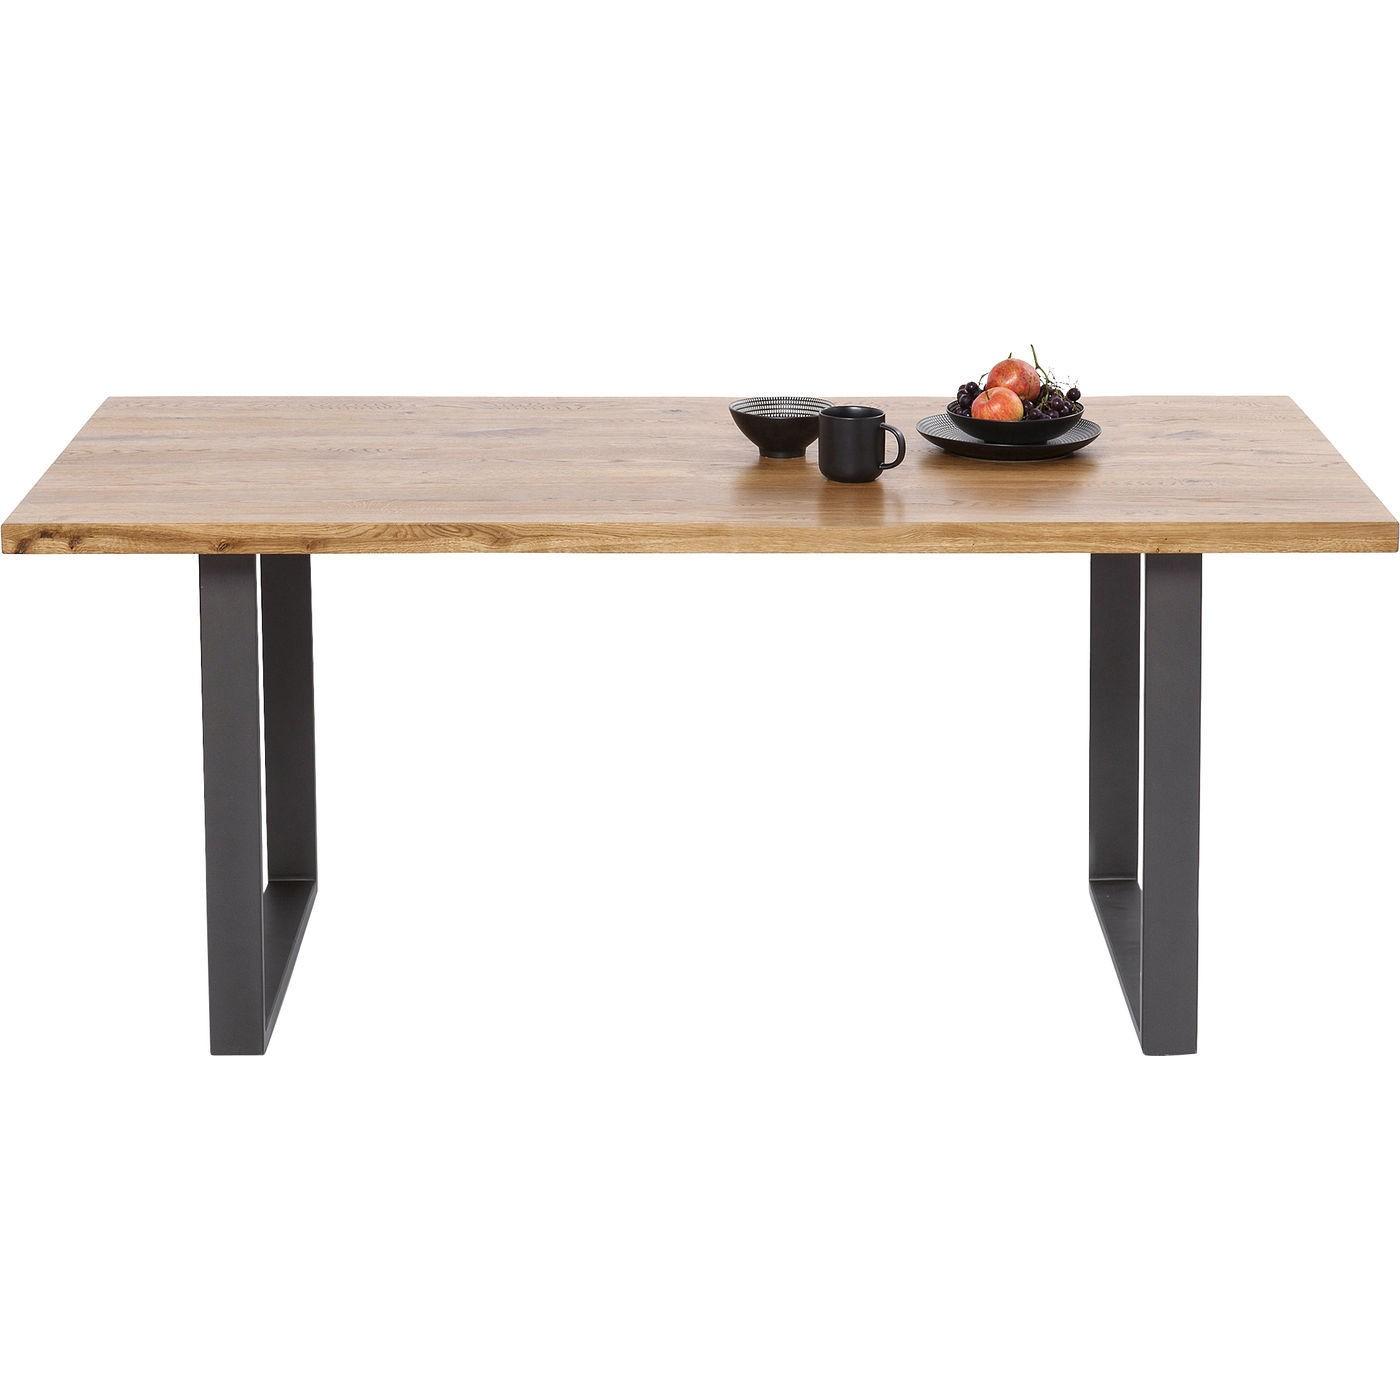 Table Jackie chêne acier 180x90cm Kare Design